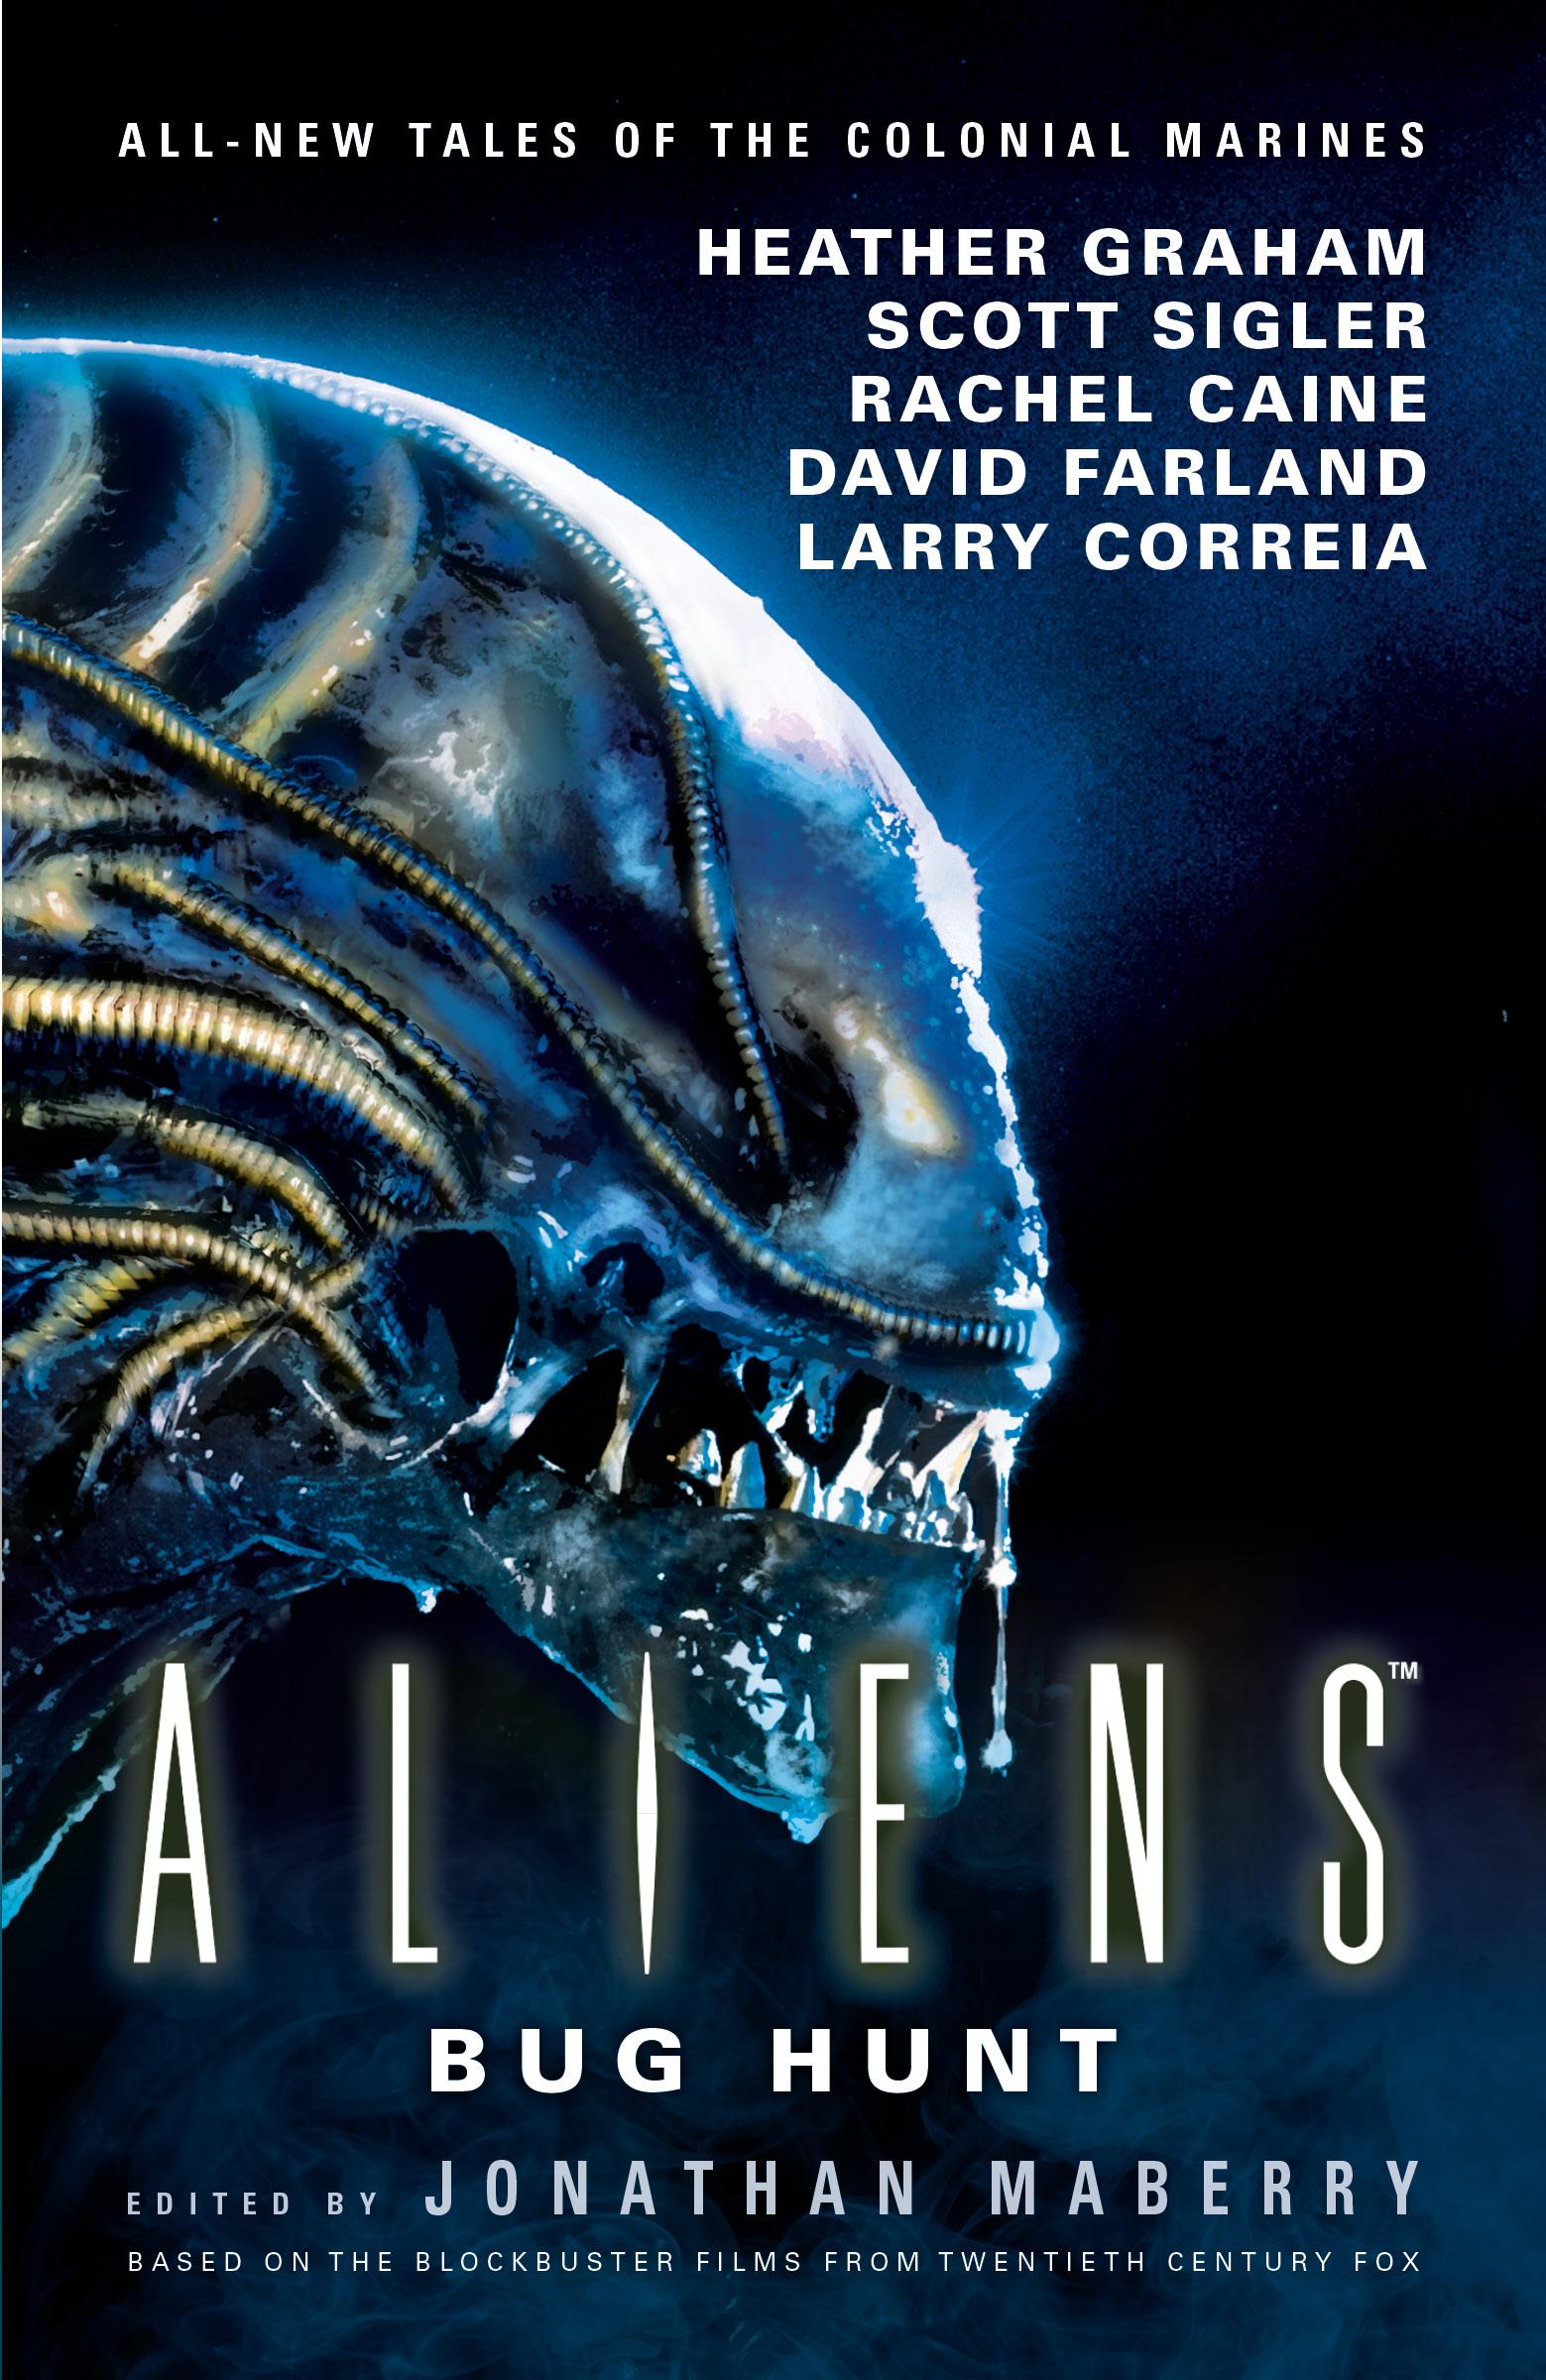 Aliens: Bug Hunt Review